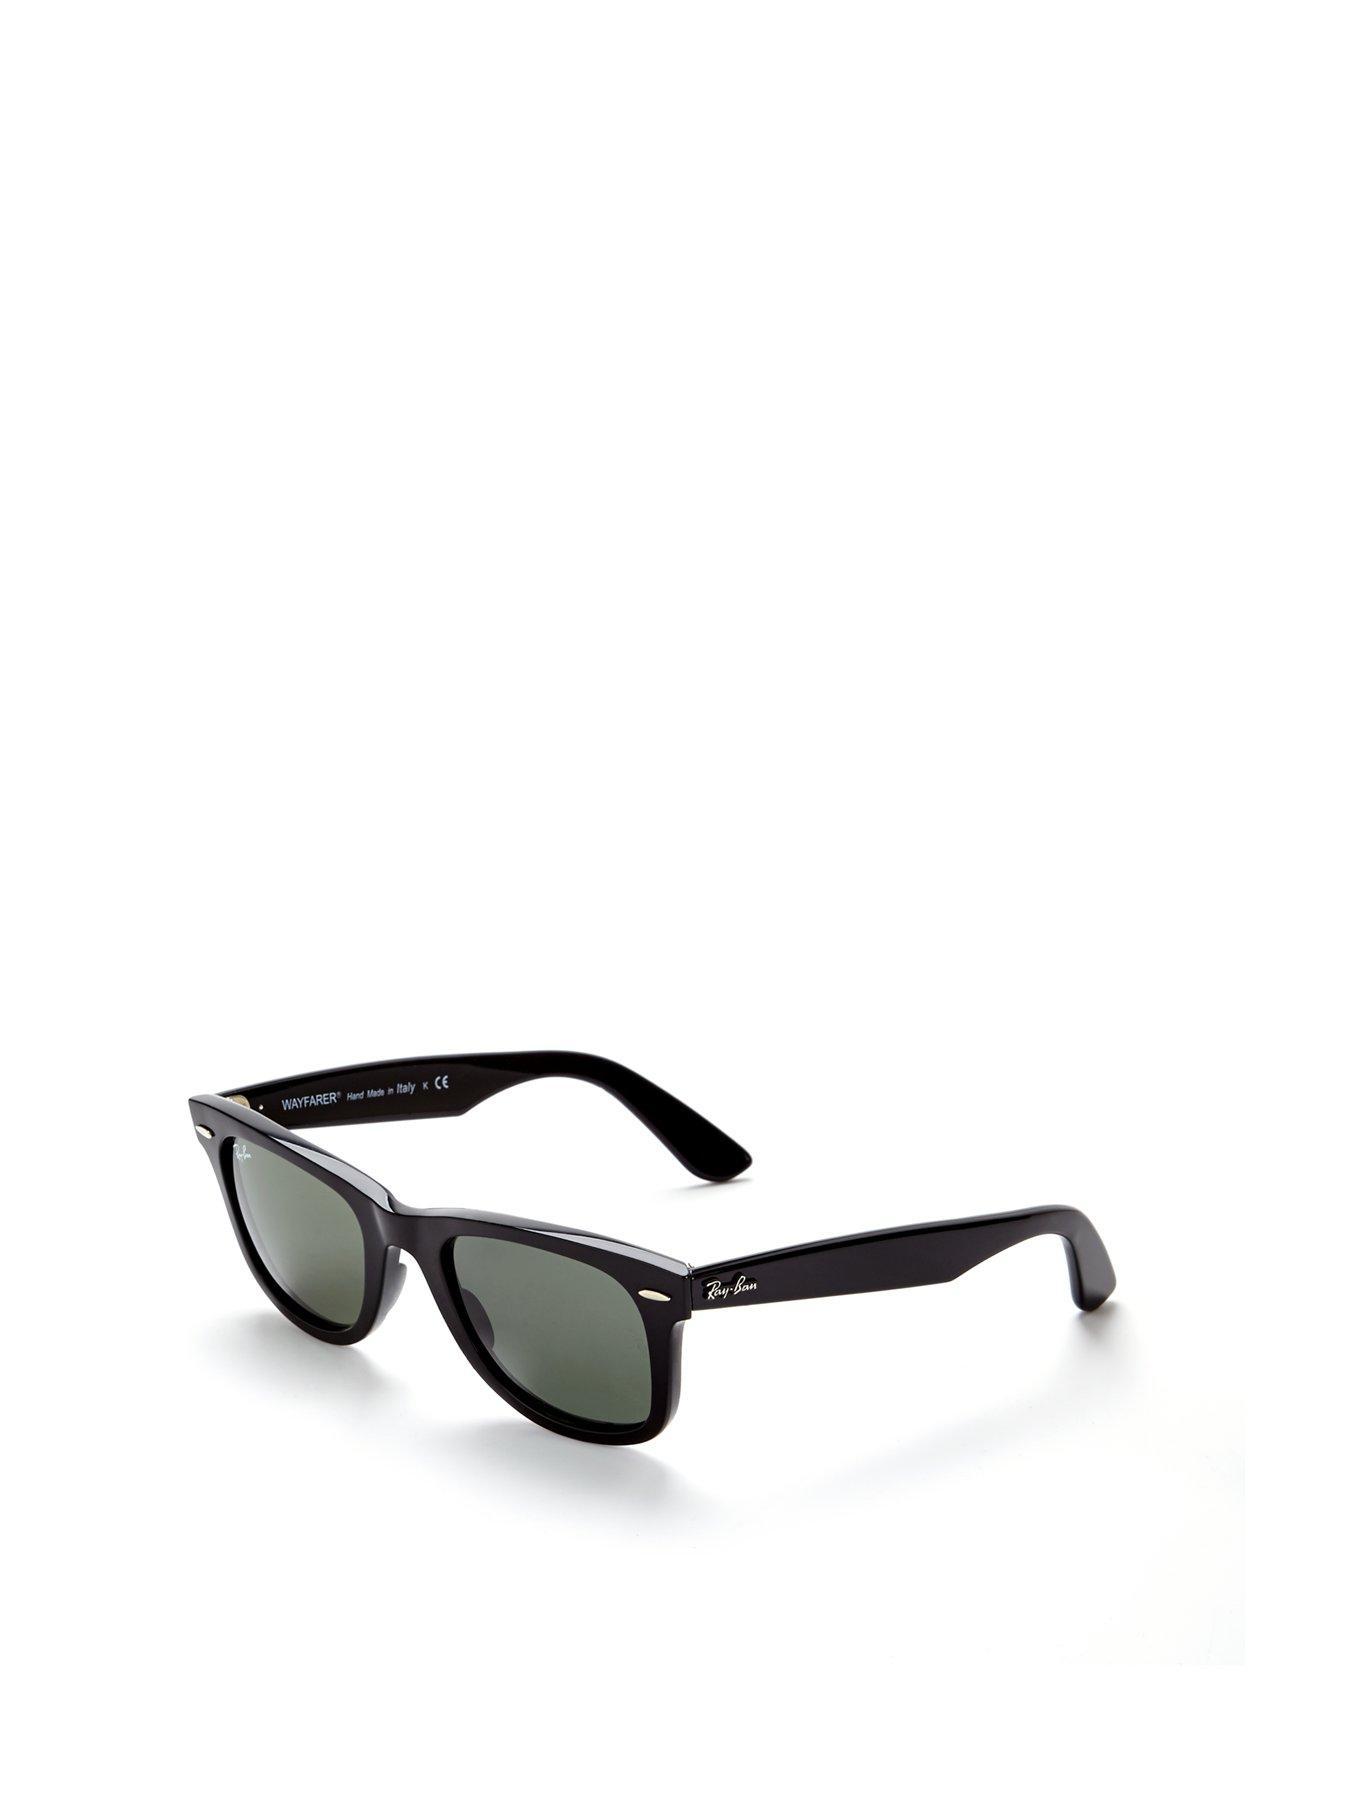 9a3f6b52982 Ray Ban Wayfarer Sunglasses Uk Sale « Heritage Malta